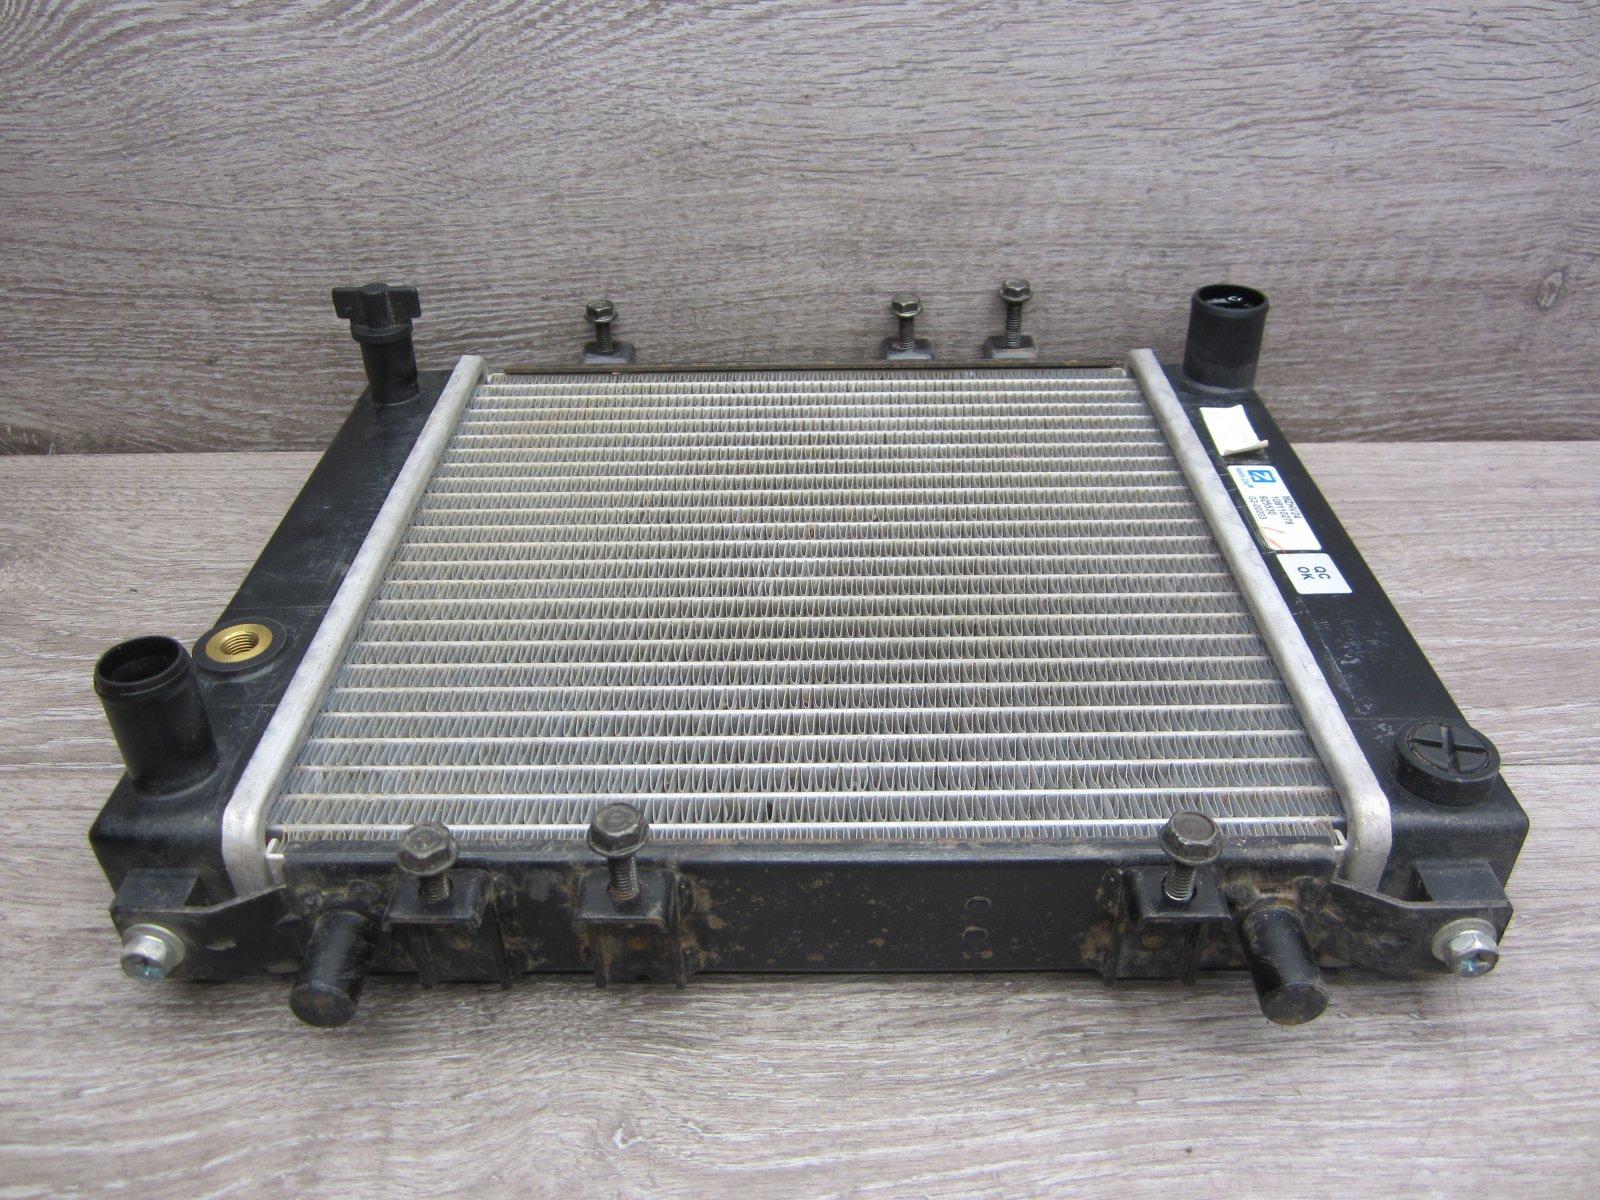 quad tgb target gunner 500 525 550 radiateur refroidisseur d 39 eau tgb d9900052 ebay. Black Bedroom Furniture Sets. Home Design Ideas